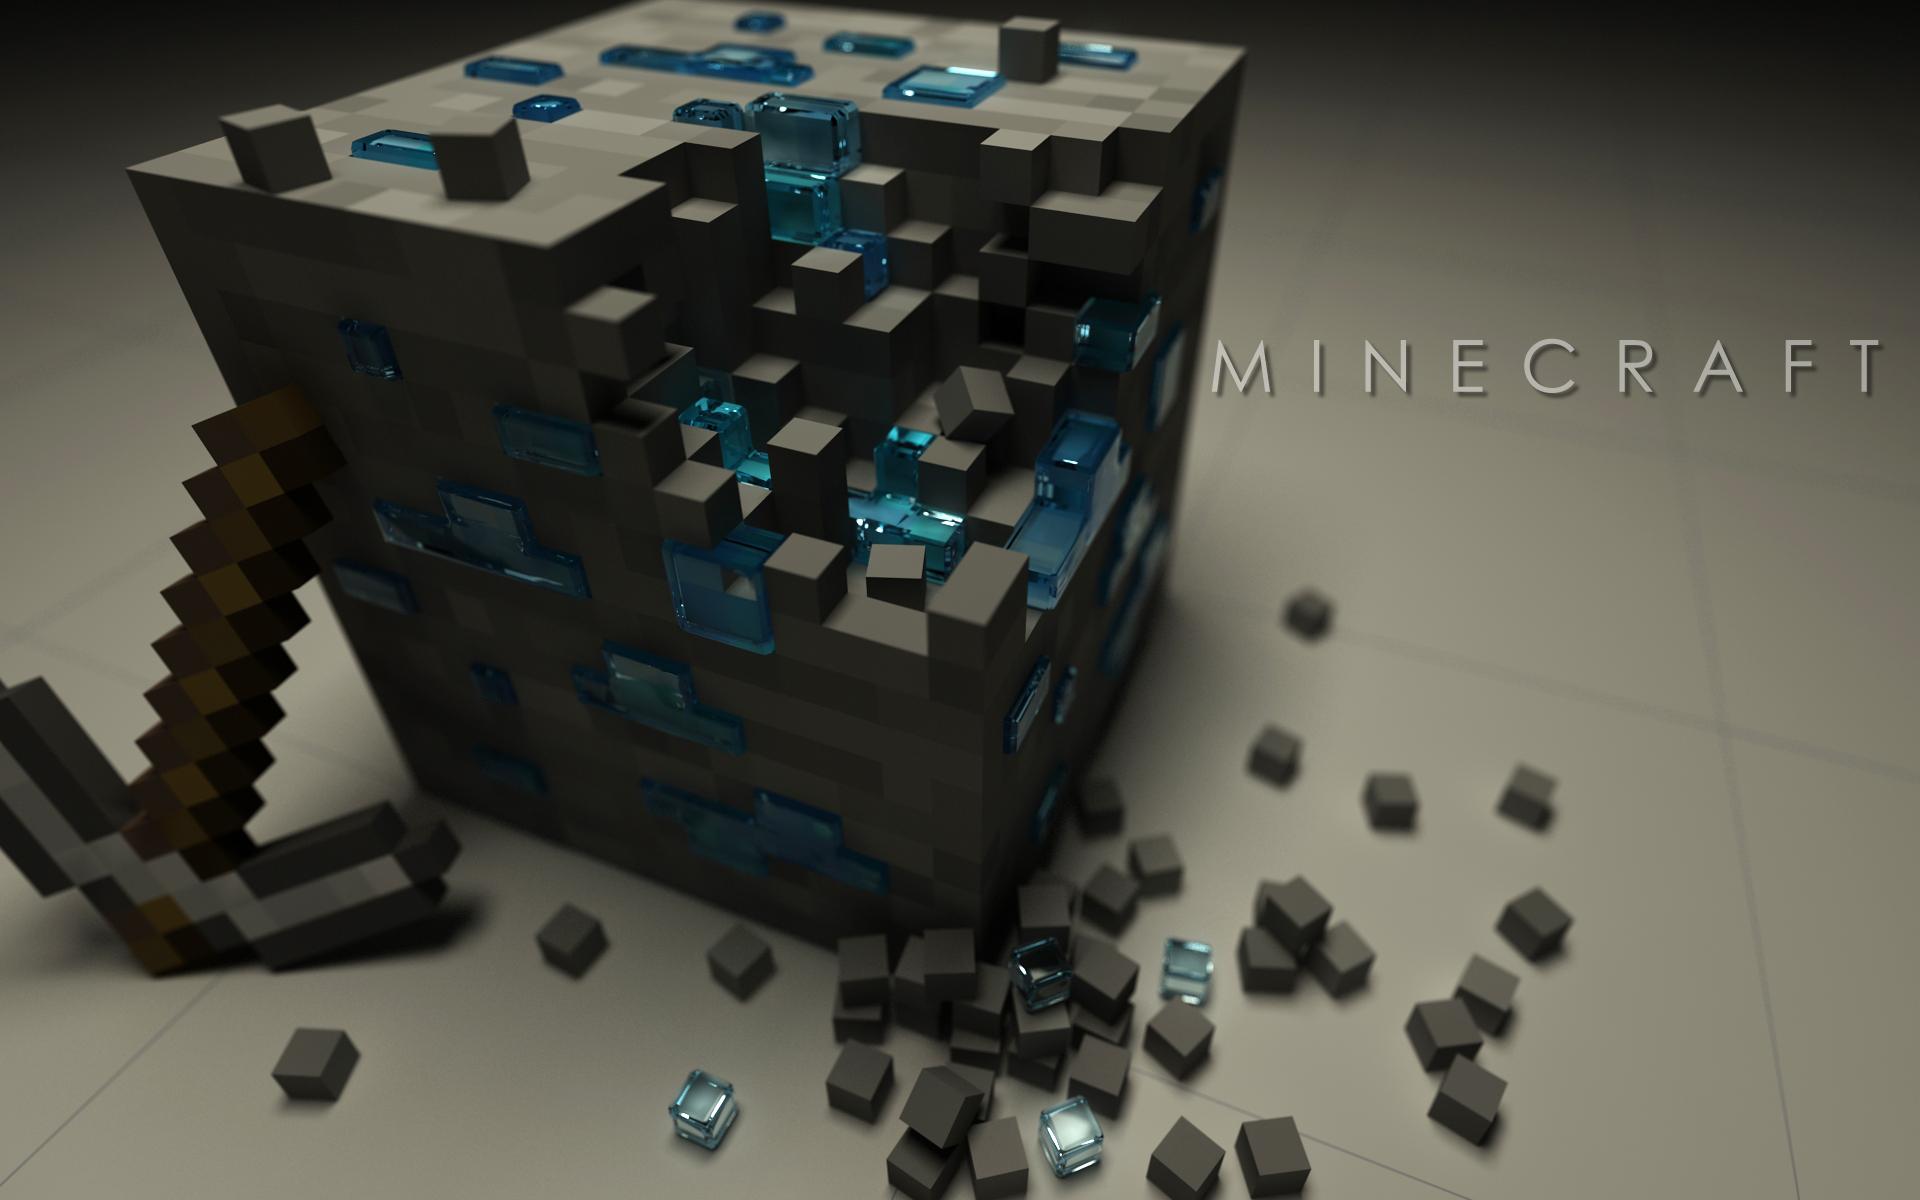 hinh nen minecraft 32